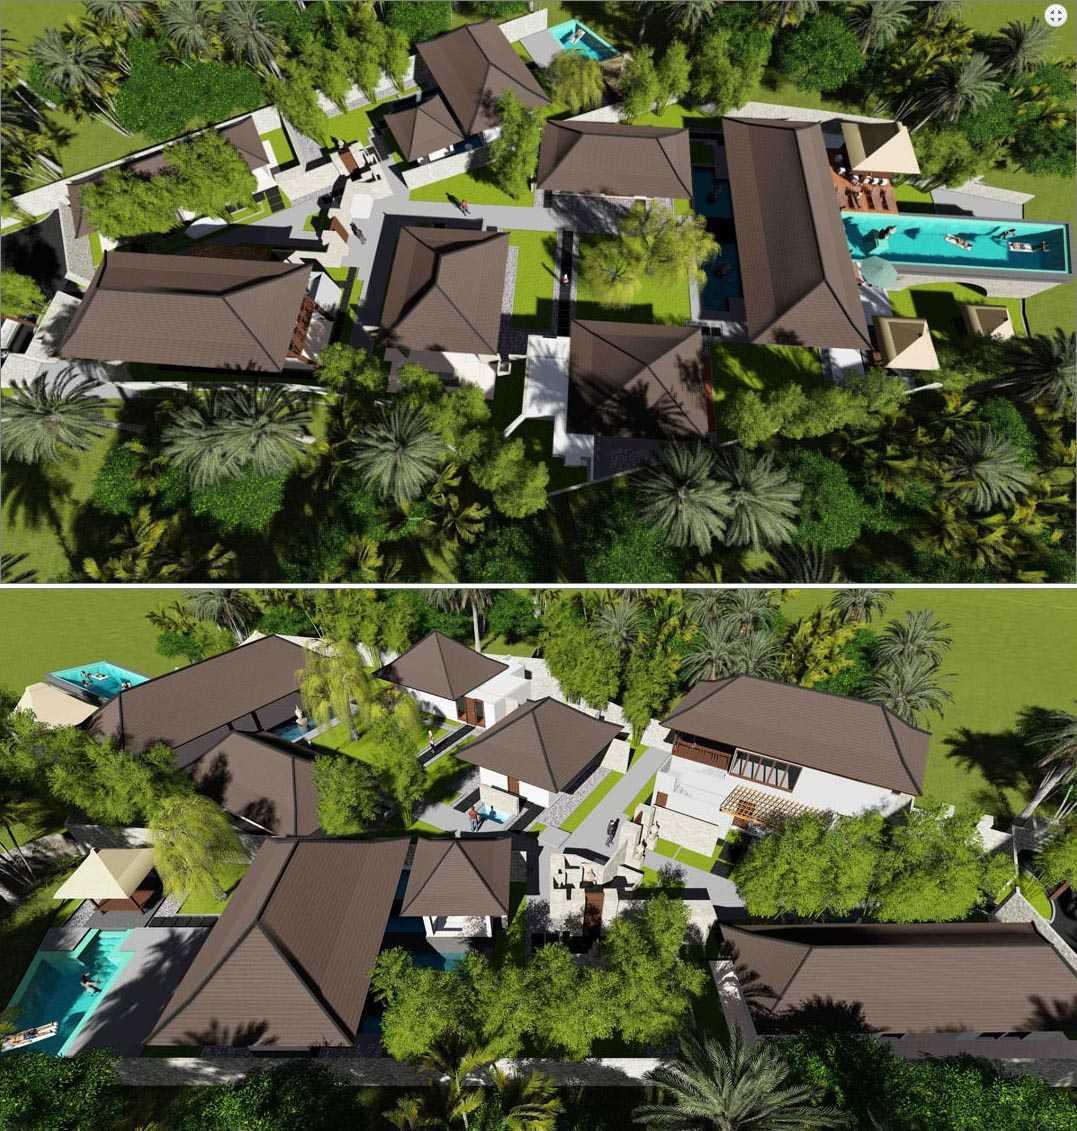 Agung Budi Raharsa | Architecture & Engineering Villa Indah Manis - Bali Bali, Indonesia Pecatu, Bali Agung-Budi-Raharsa-Villa-Indah-Manis-Bali   88375